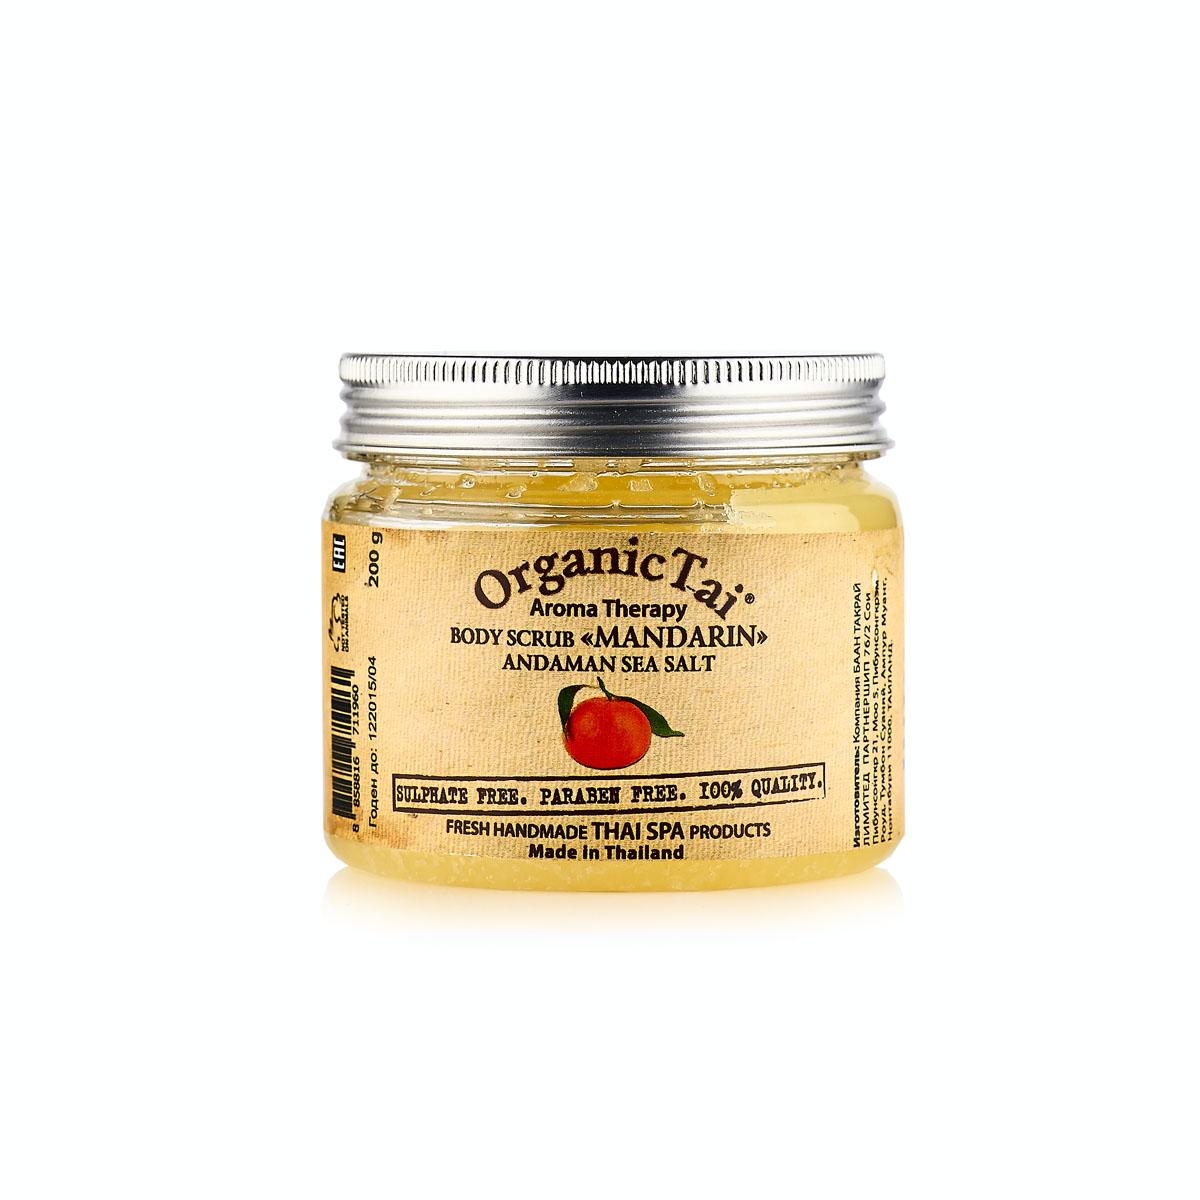 цена на OrganicTai Скраб для тела на основе соли Андаманского моря «МАНДАРИН» 200 гр